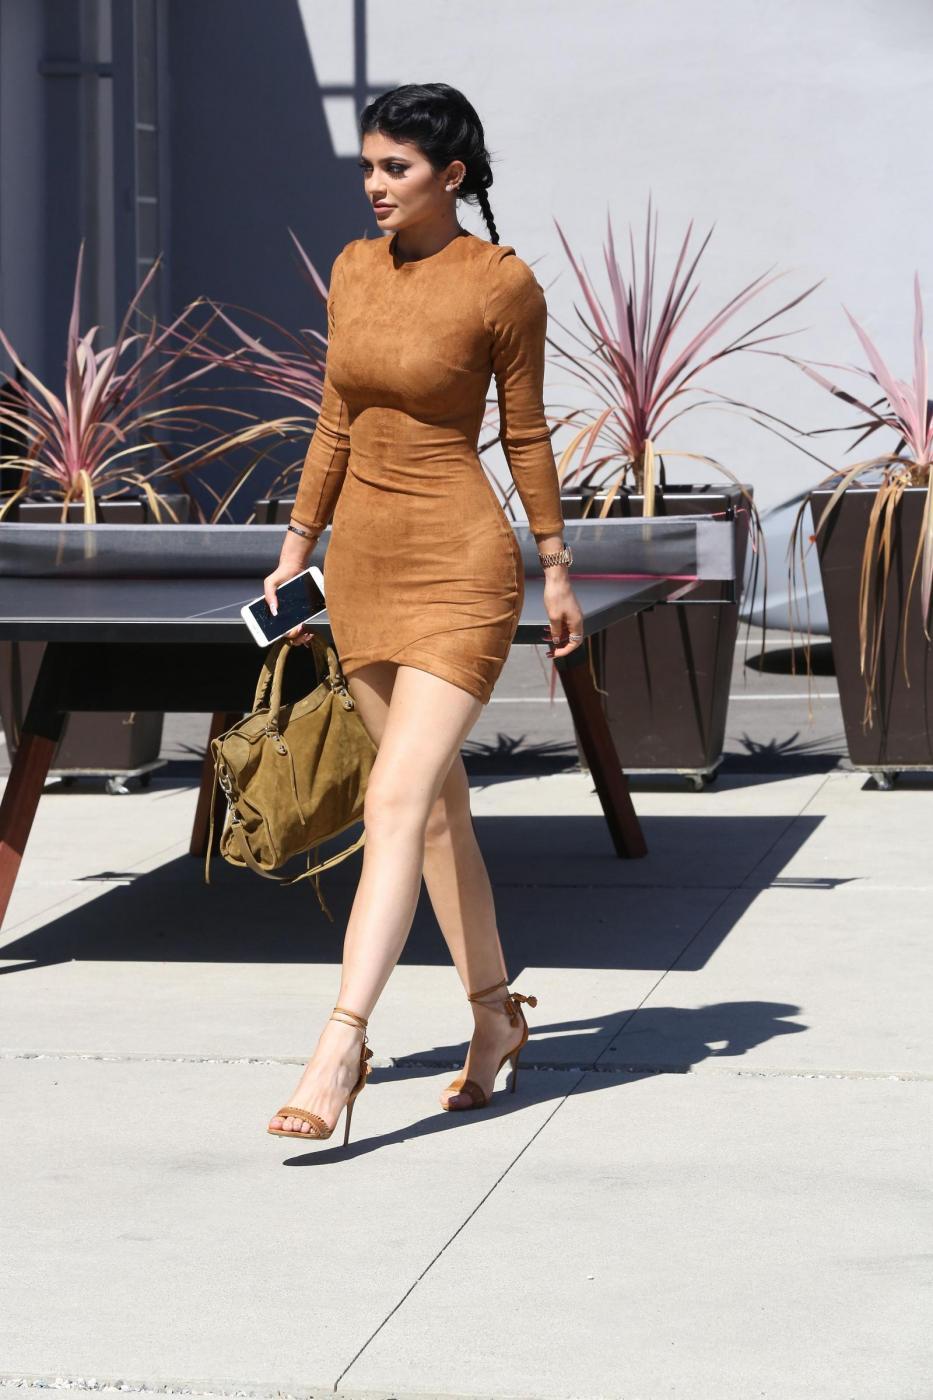 Kylie Jenner sexy: miniabito, trucco da Barbie e Ferrari12